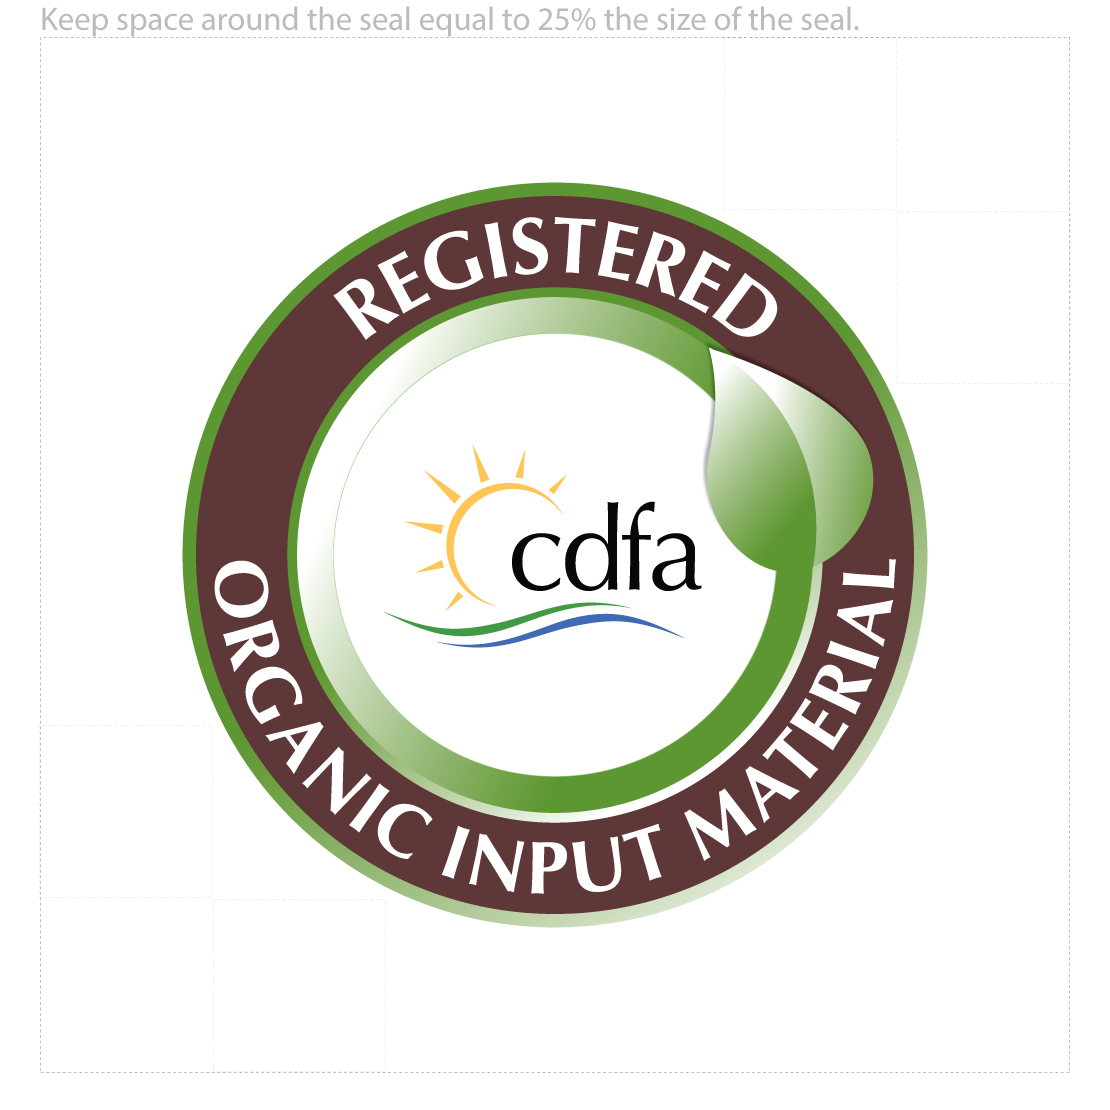 CDFA - IS - Organic Input Material Program